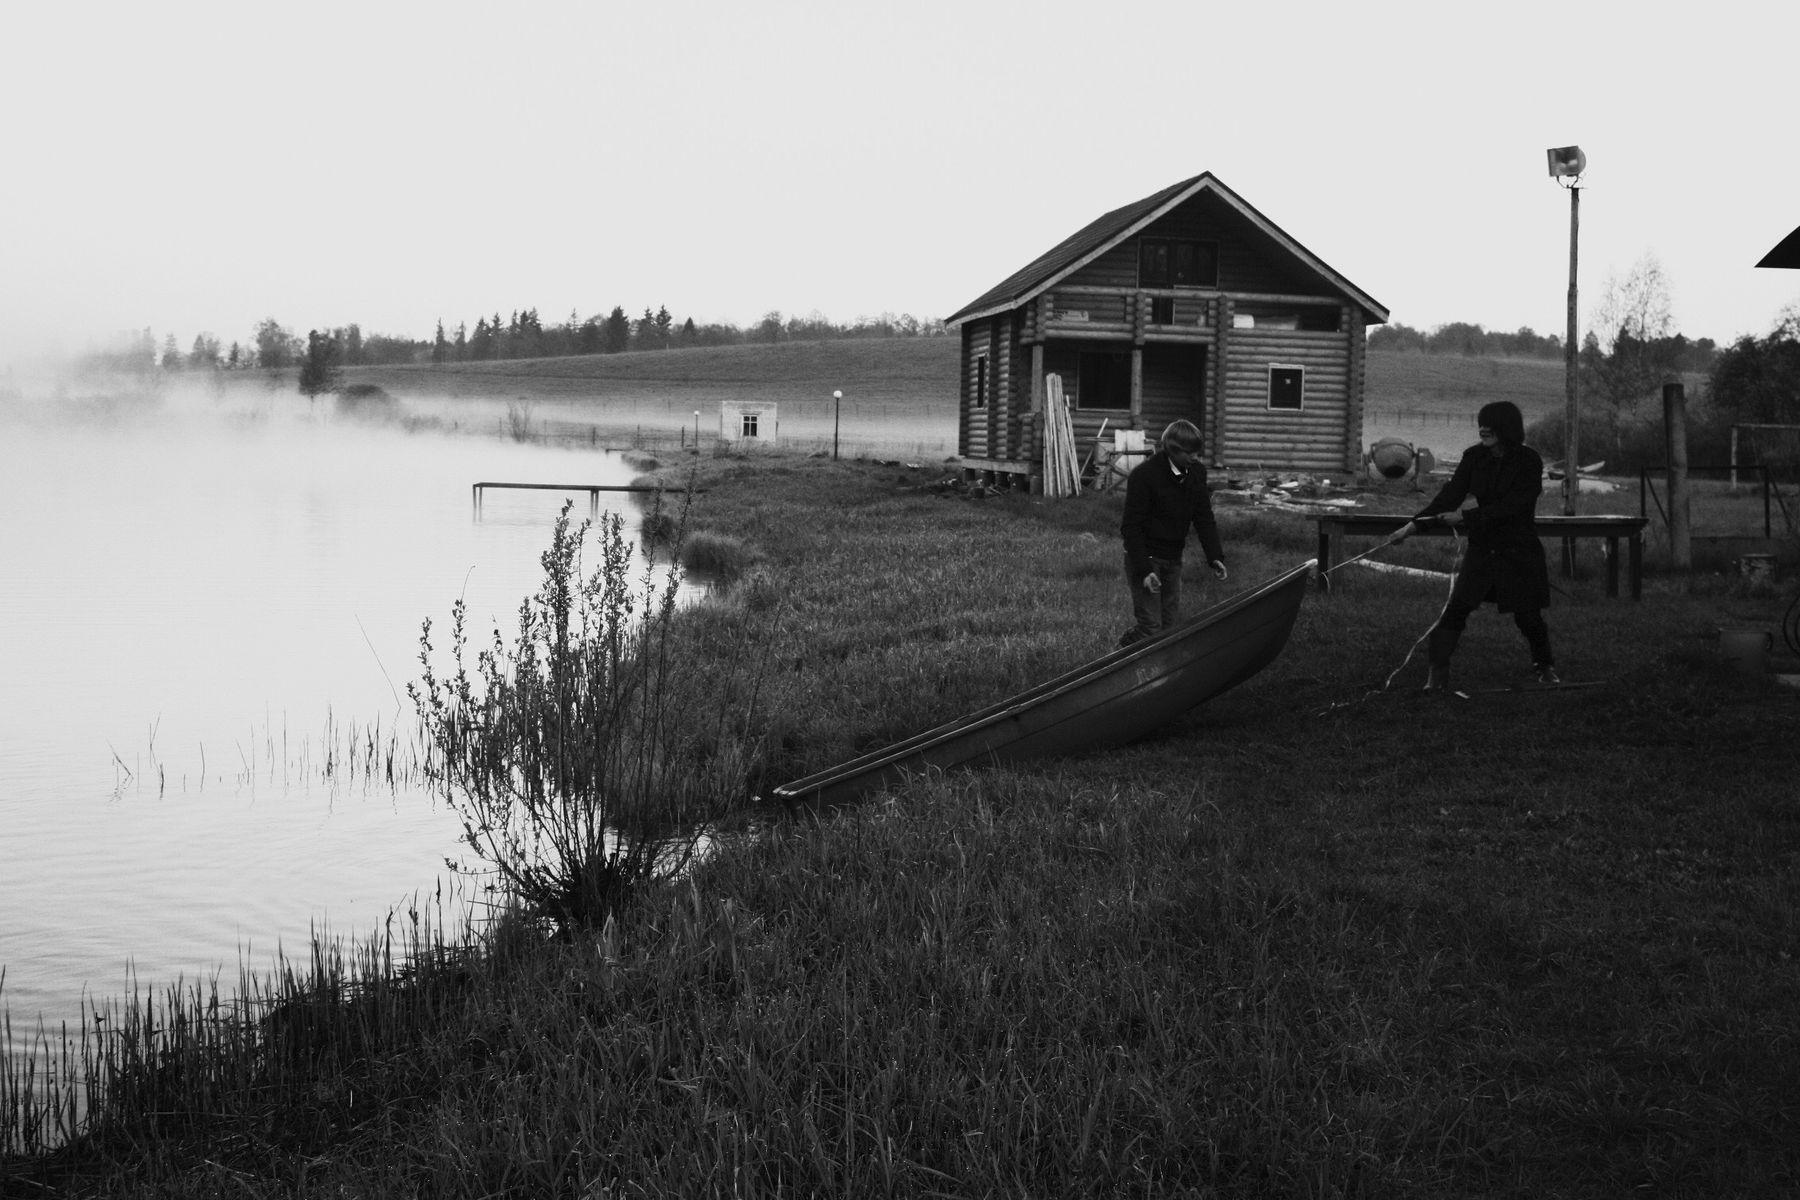 *** лодка берег переправа утро туман пейзаж избушка дом пирс чб люди трава фонарь